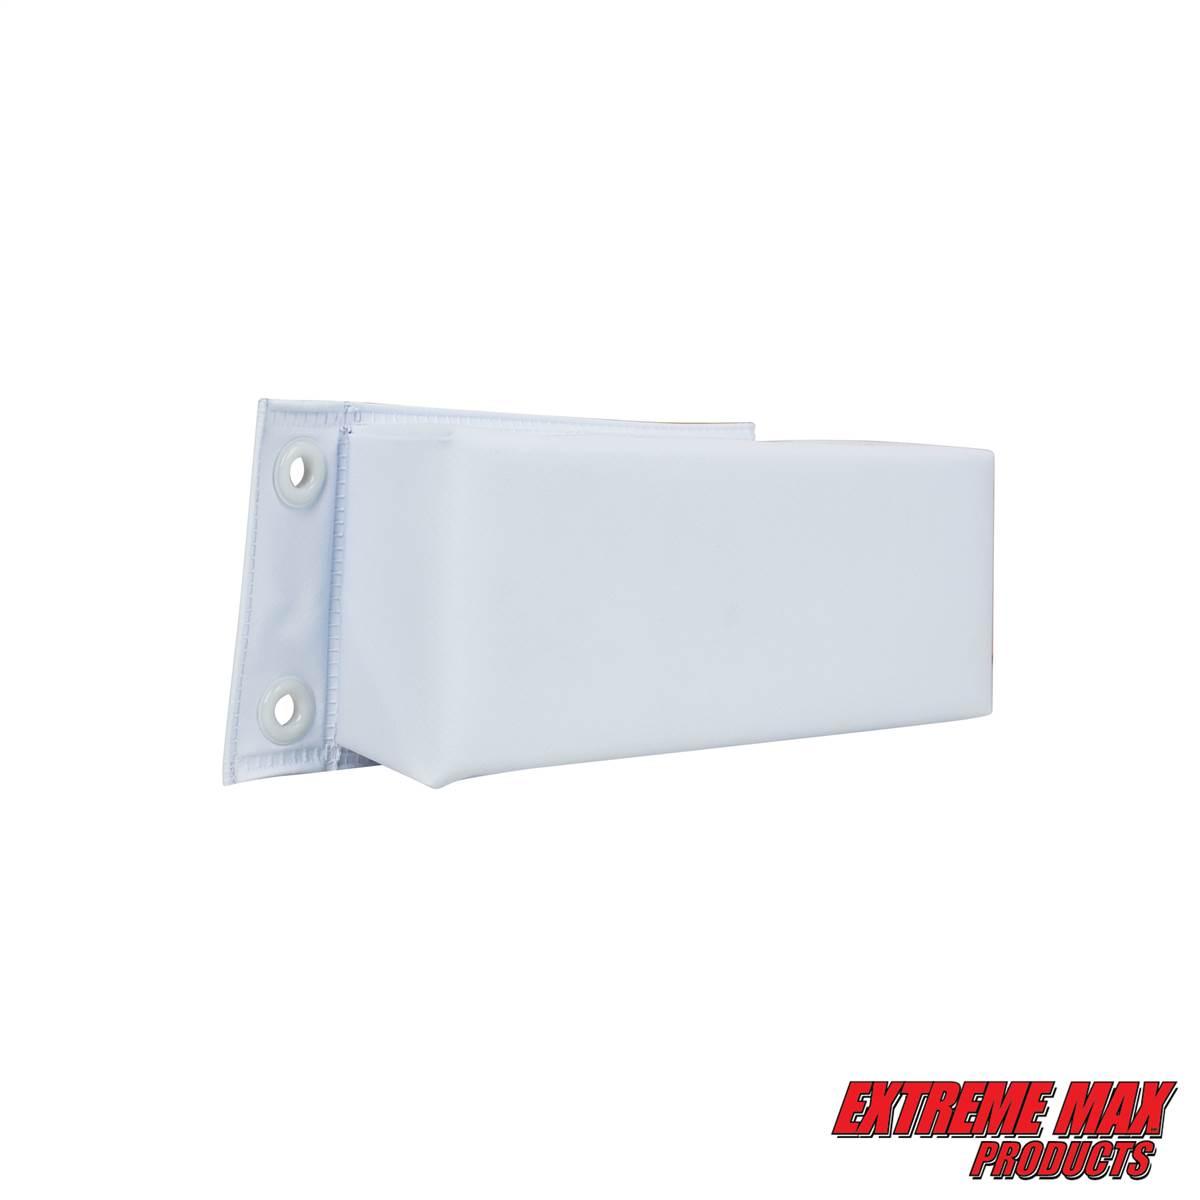 "Extreme Max 3006.7255 BoatTector Dock Bumper//Corner WHITE 10/"" X 10/"" X 4/"" X 2.5/"""